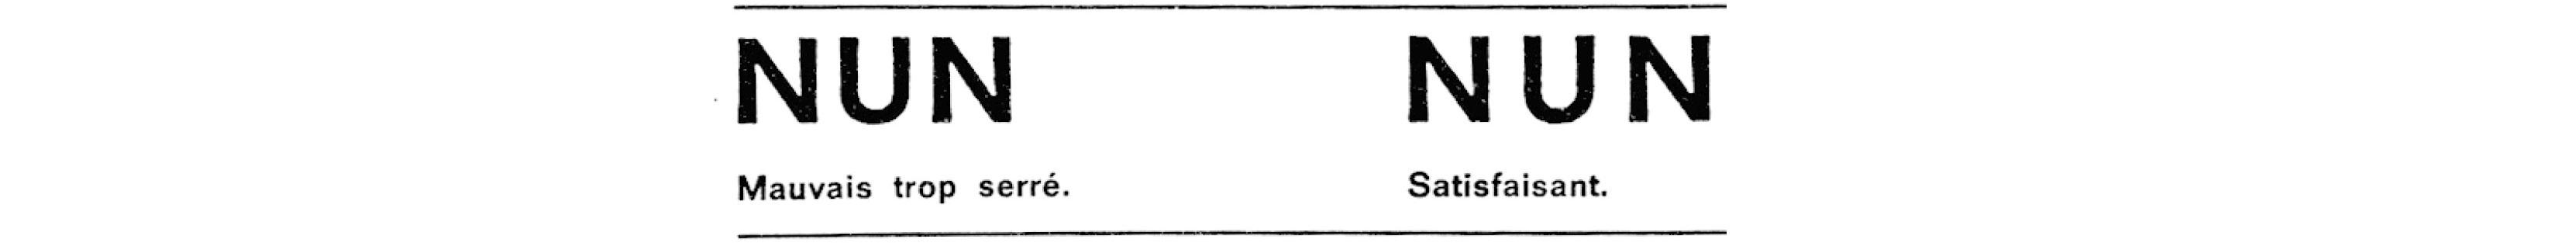 Jan-Tschichold-te-parle-de-typographie-article-Persee-communication-et-langages-1985-schema-03